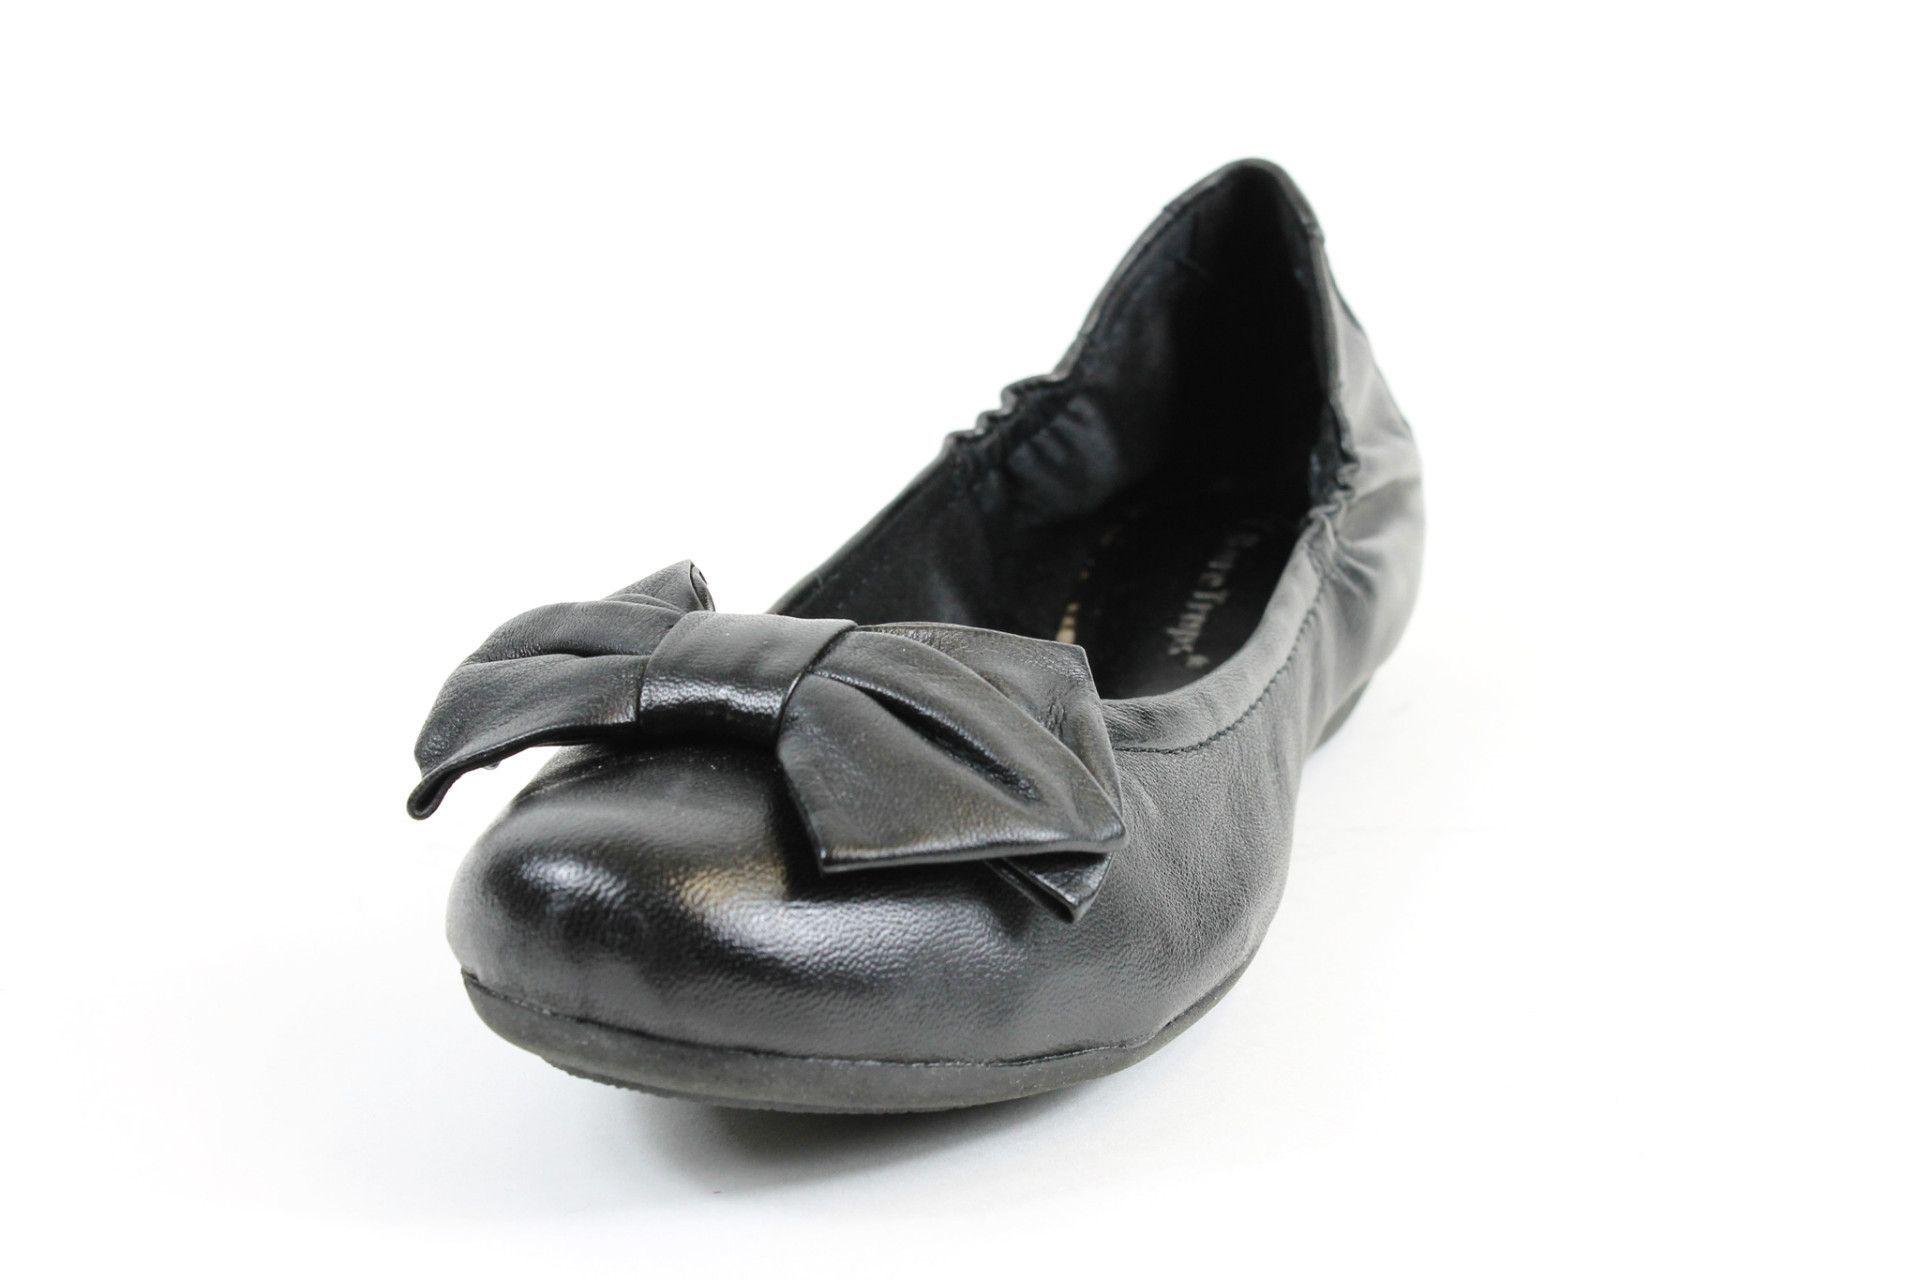 2b0633cfca7 Bare Traps Lucy Black Leather Ballet Flats